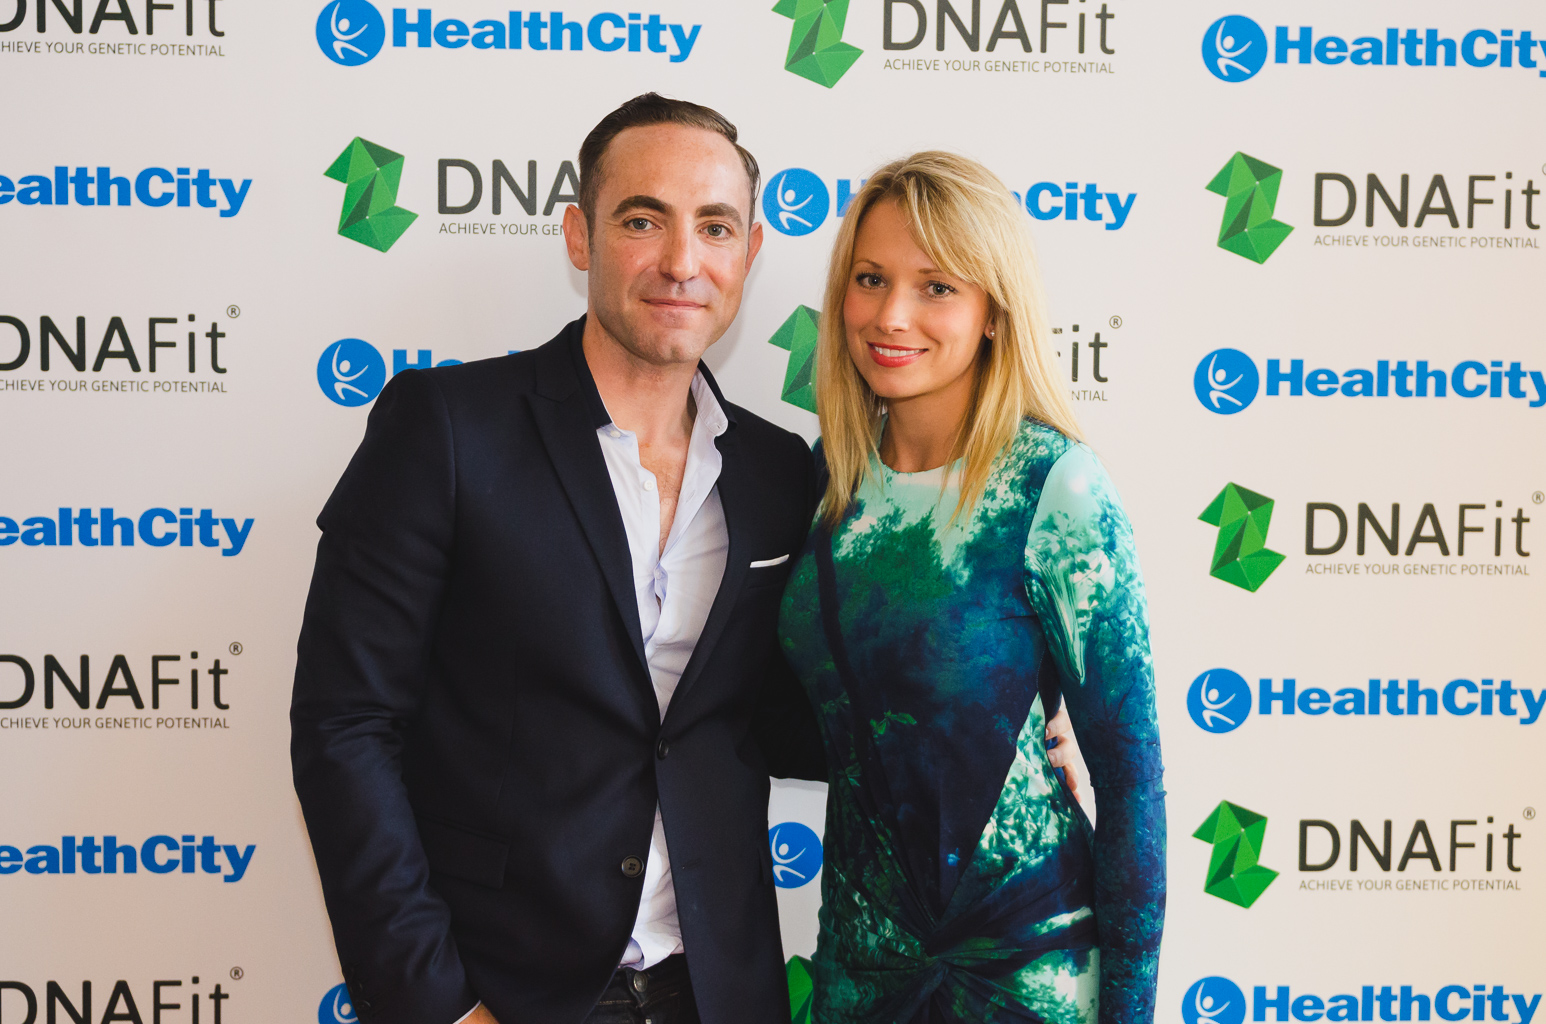 20140917 Healthcity DNAFit-005